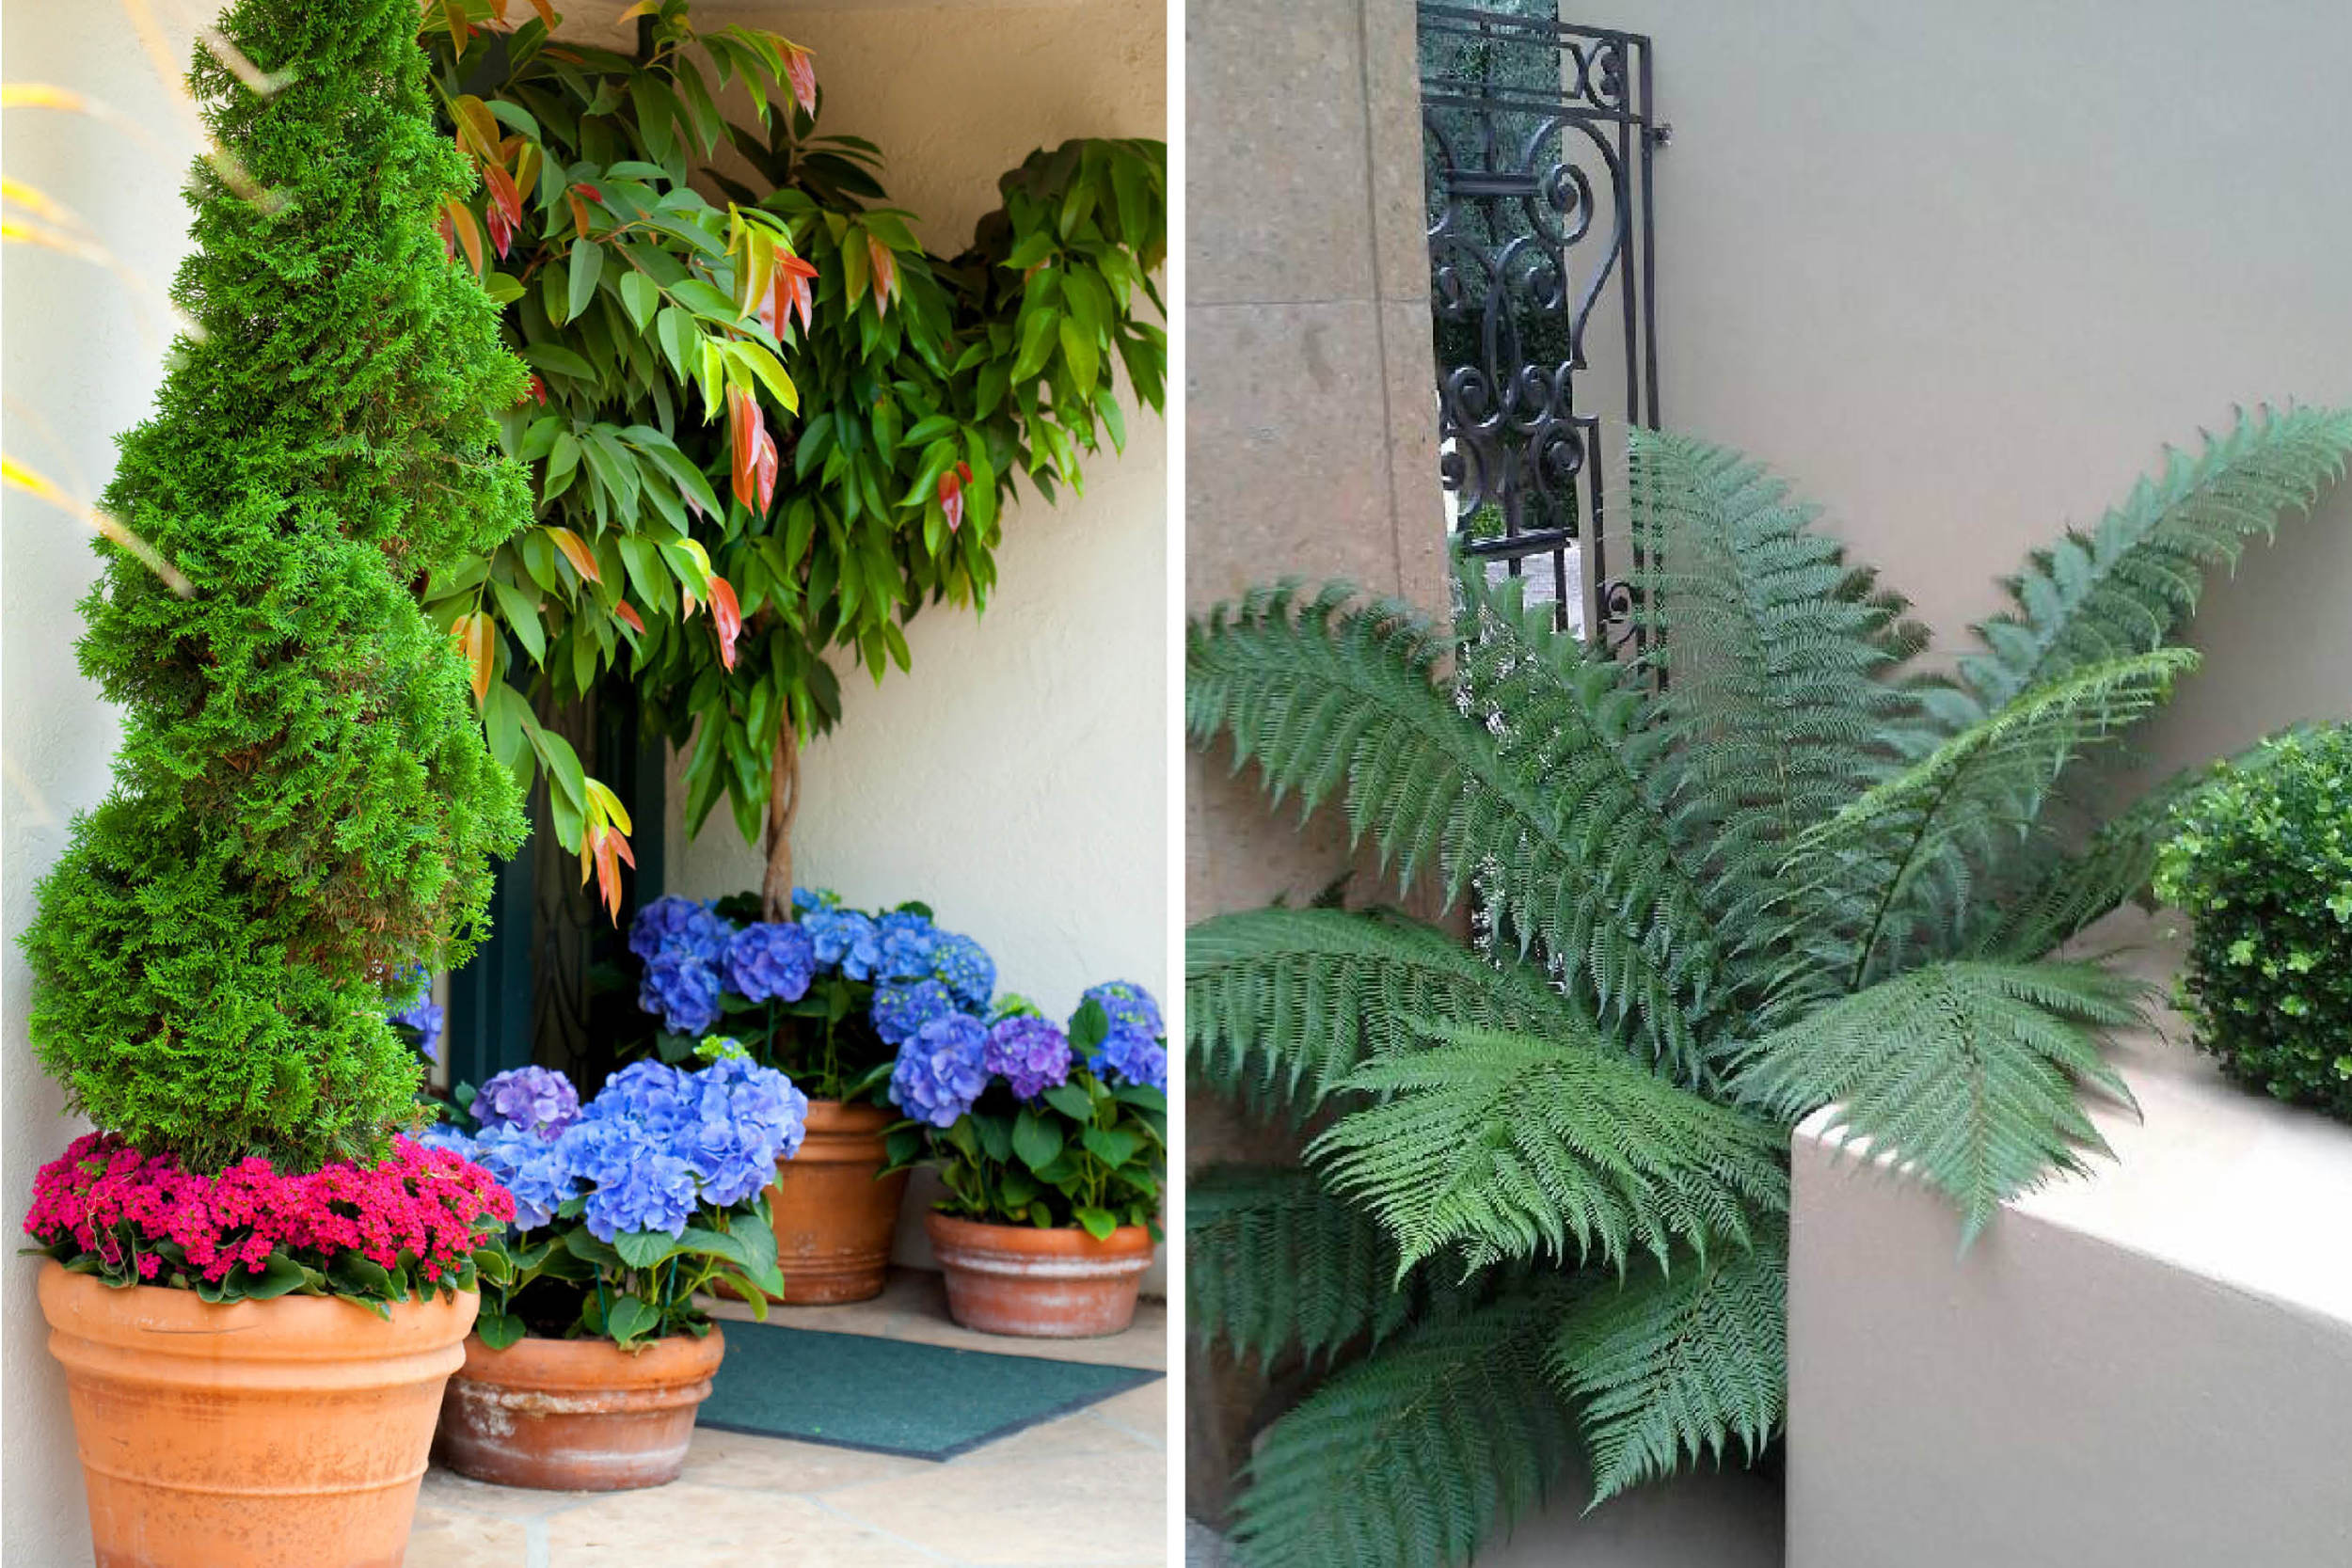 the-village-gardener-home-staging-plants-patio-decor-maintenance-interior-orchids-santa-barbara-carpinteria-losangeles-pasadena-santaynez .jpg